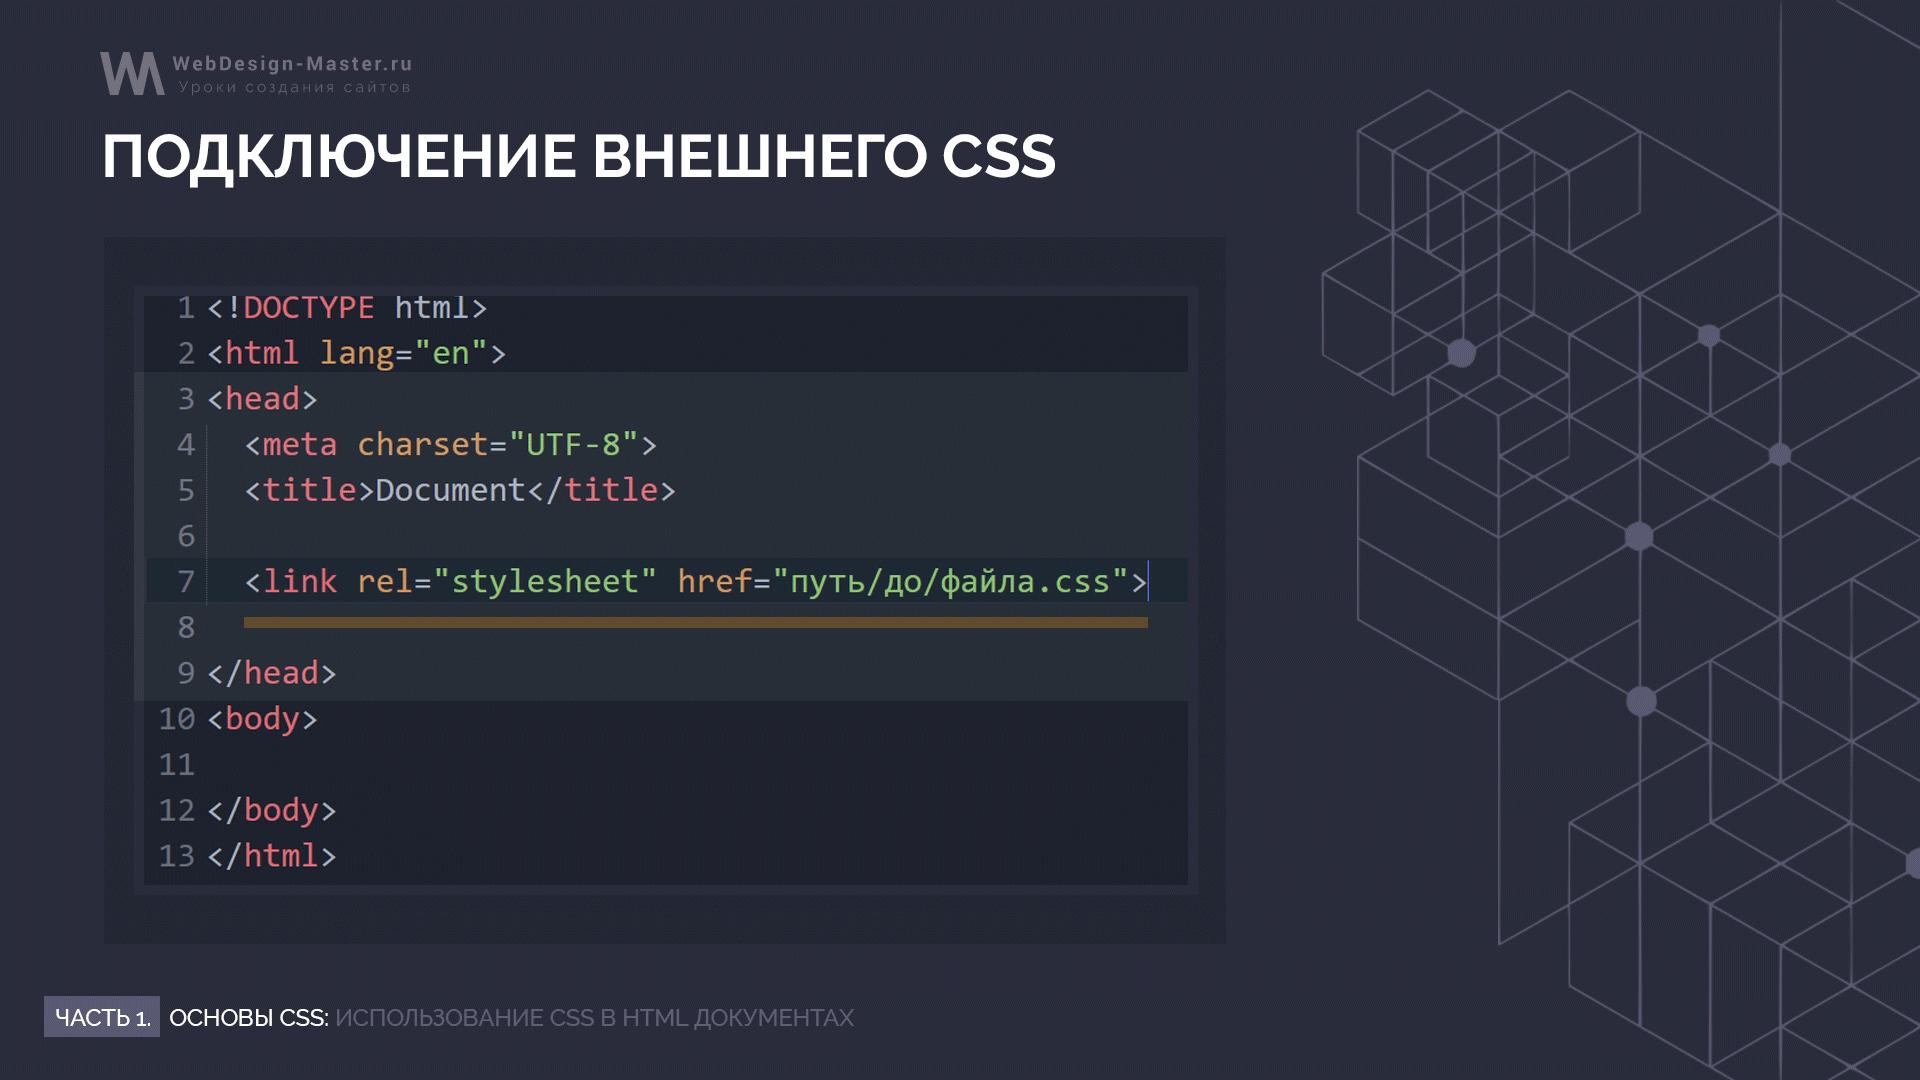 Внешнее подключение CSS файла